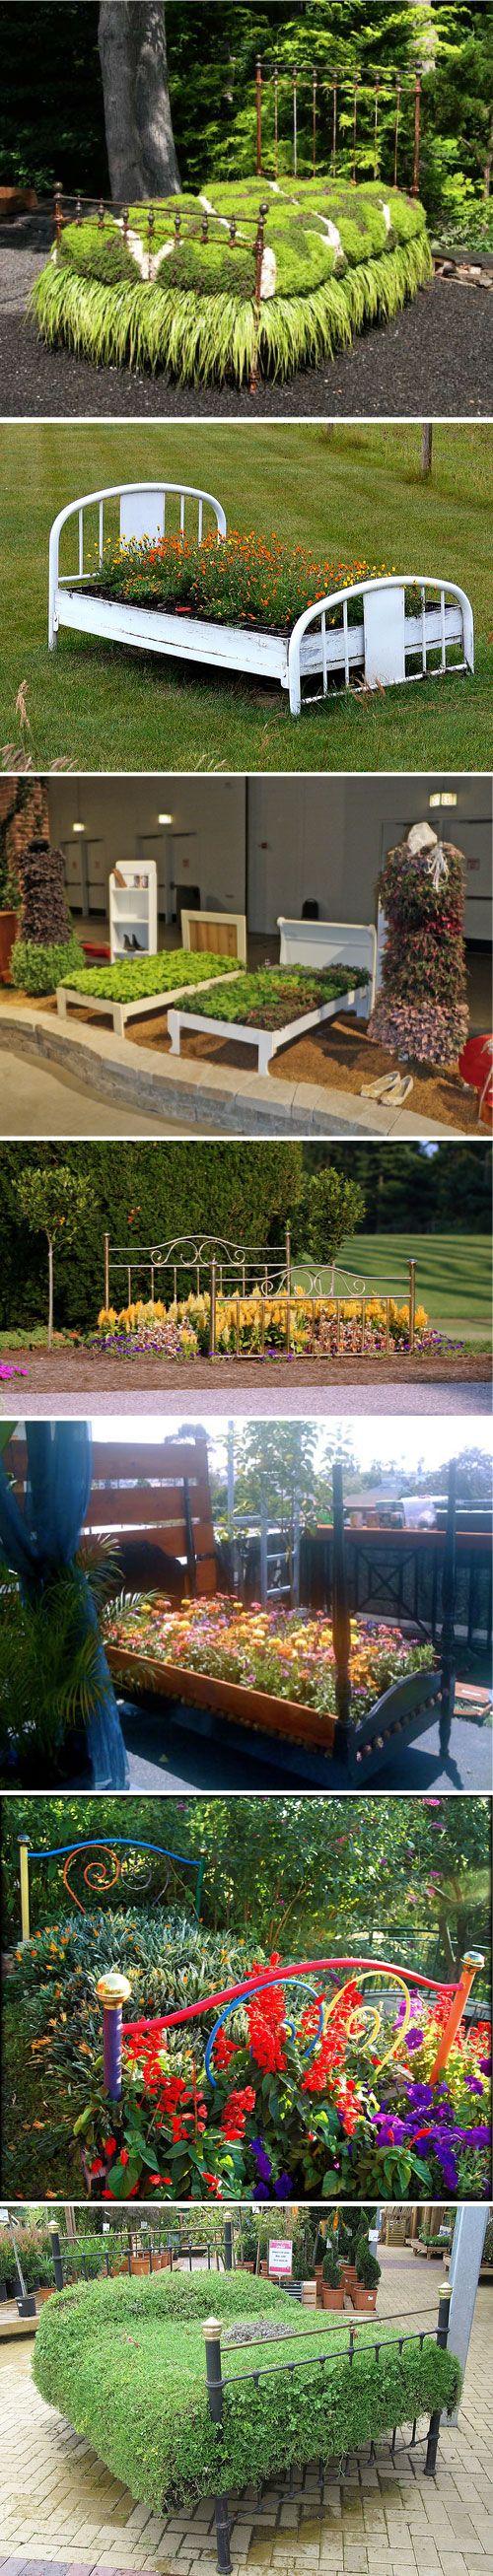 276 Best Images About Creative Garden Ideas On Pinterest Gardens